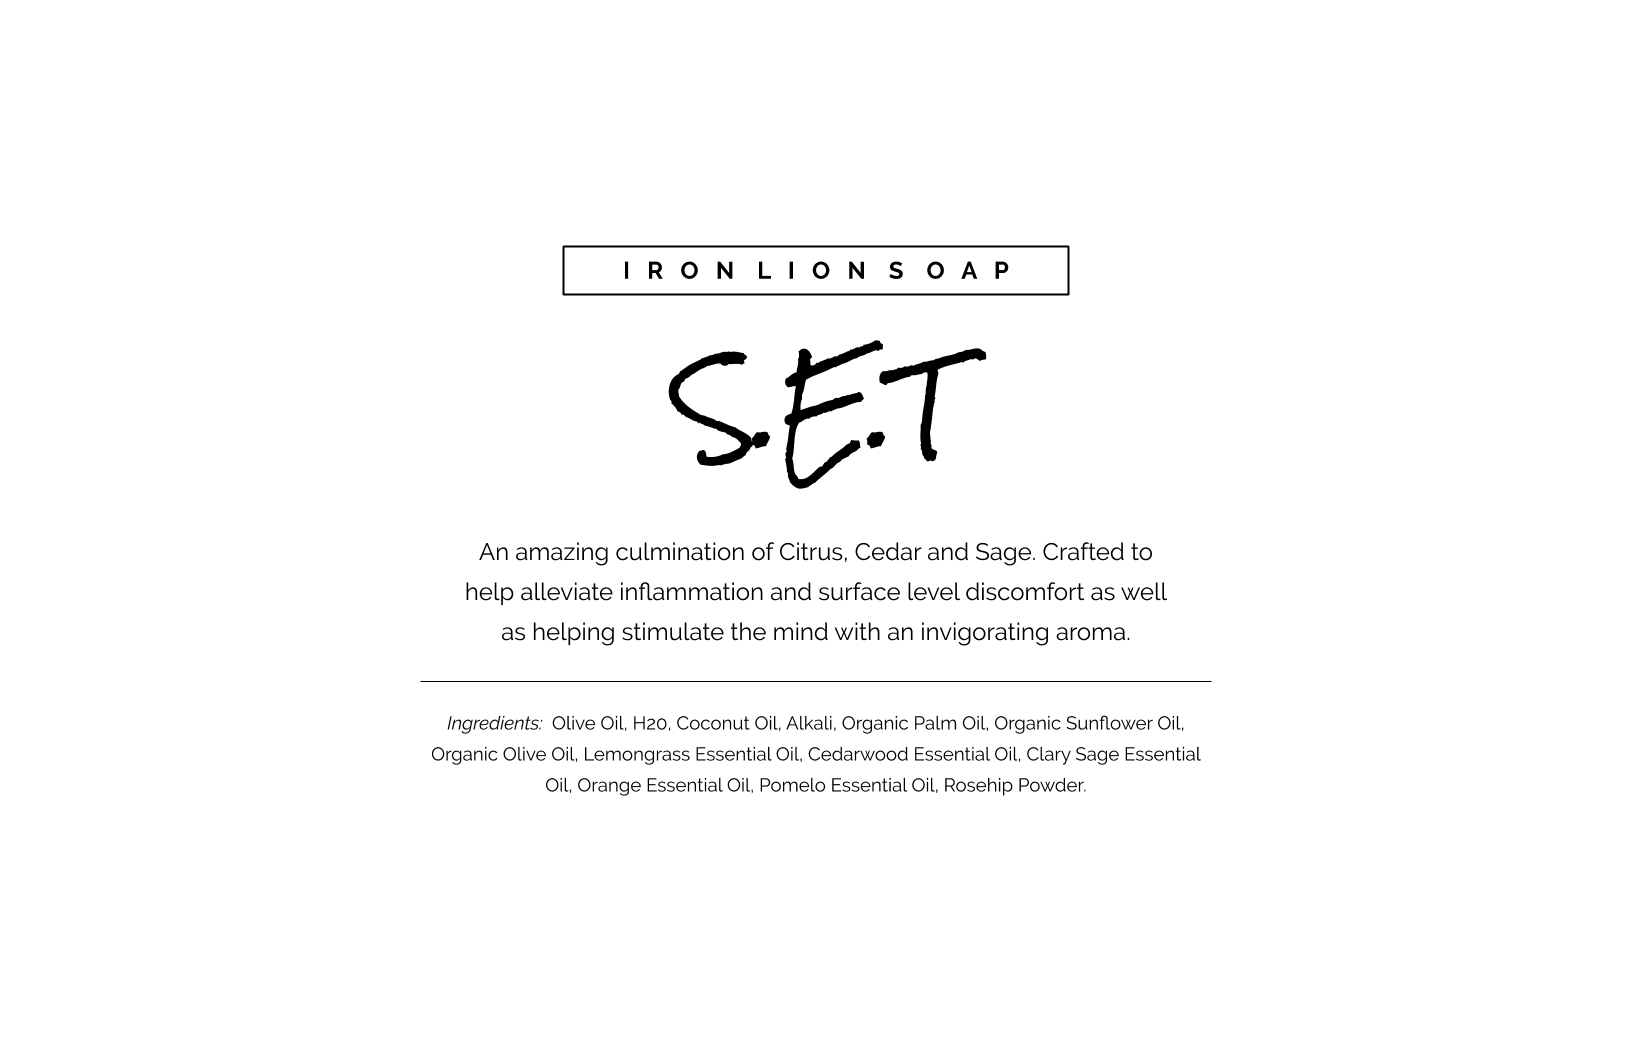 Copy of S.E.T.png